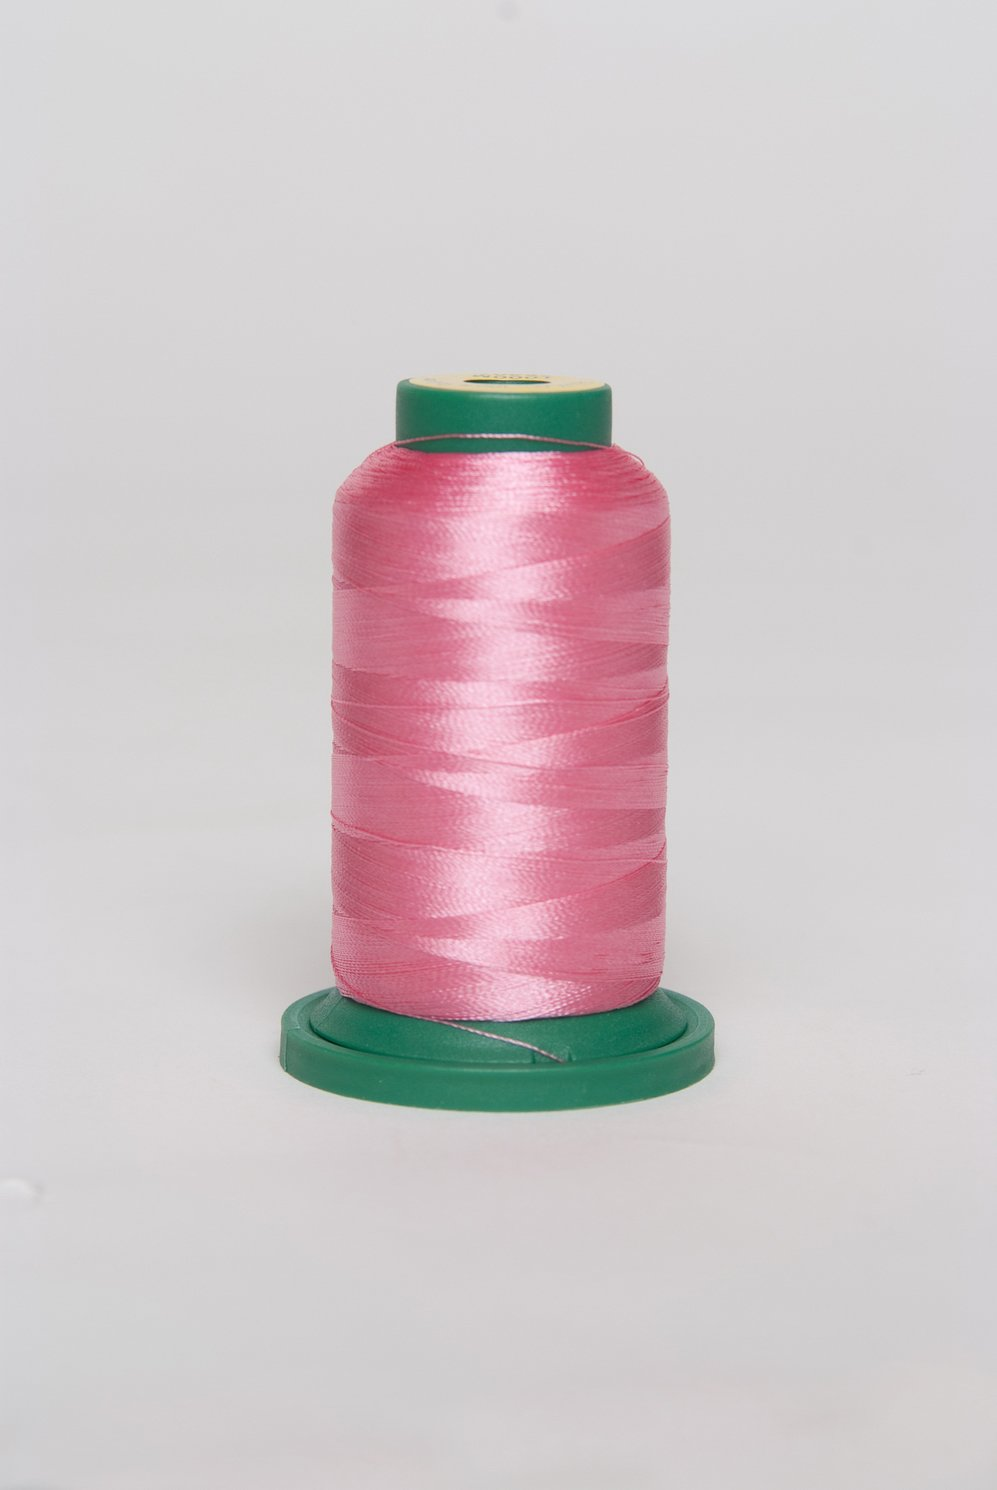 Deseret Rose - ES307 - Exquisite Embroidery Thread - 1000 meters